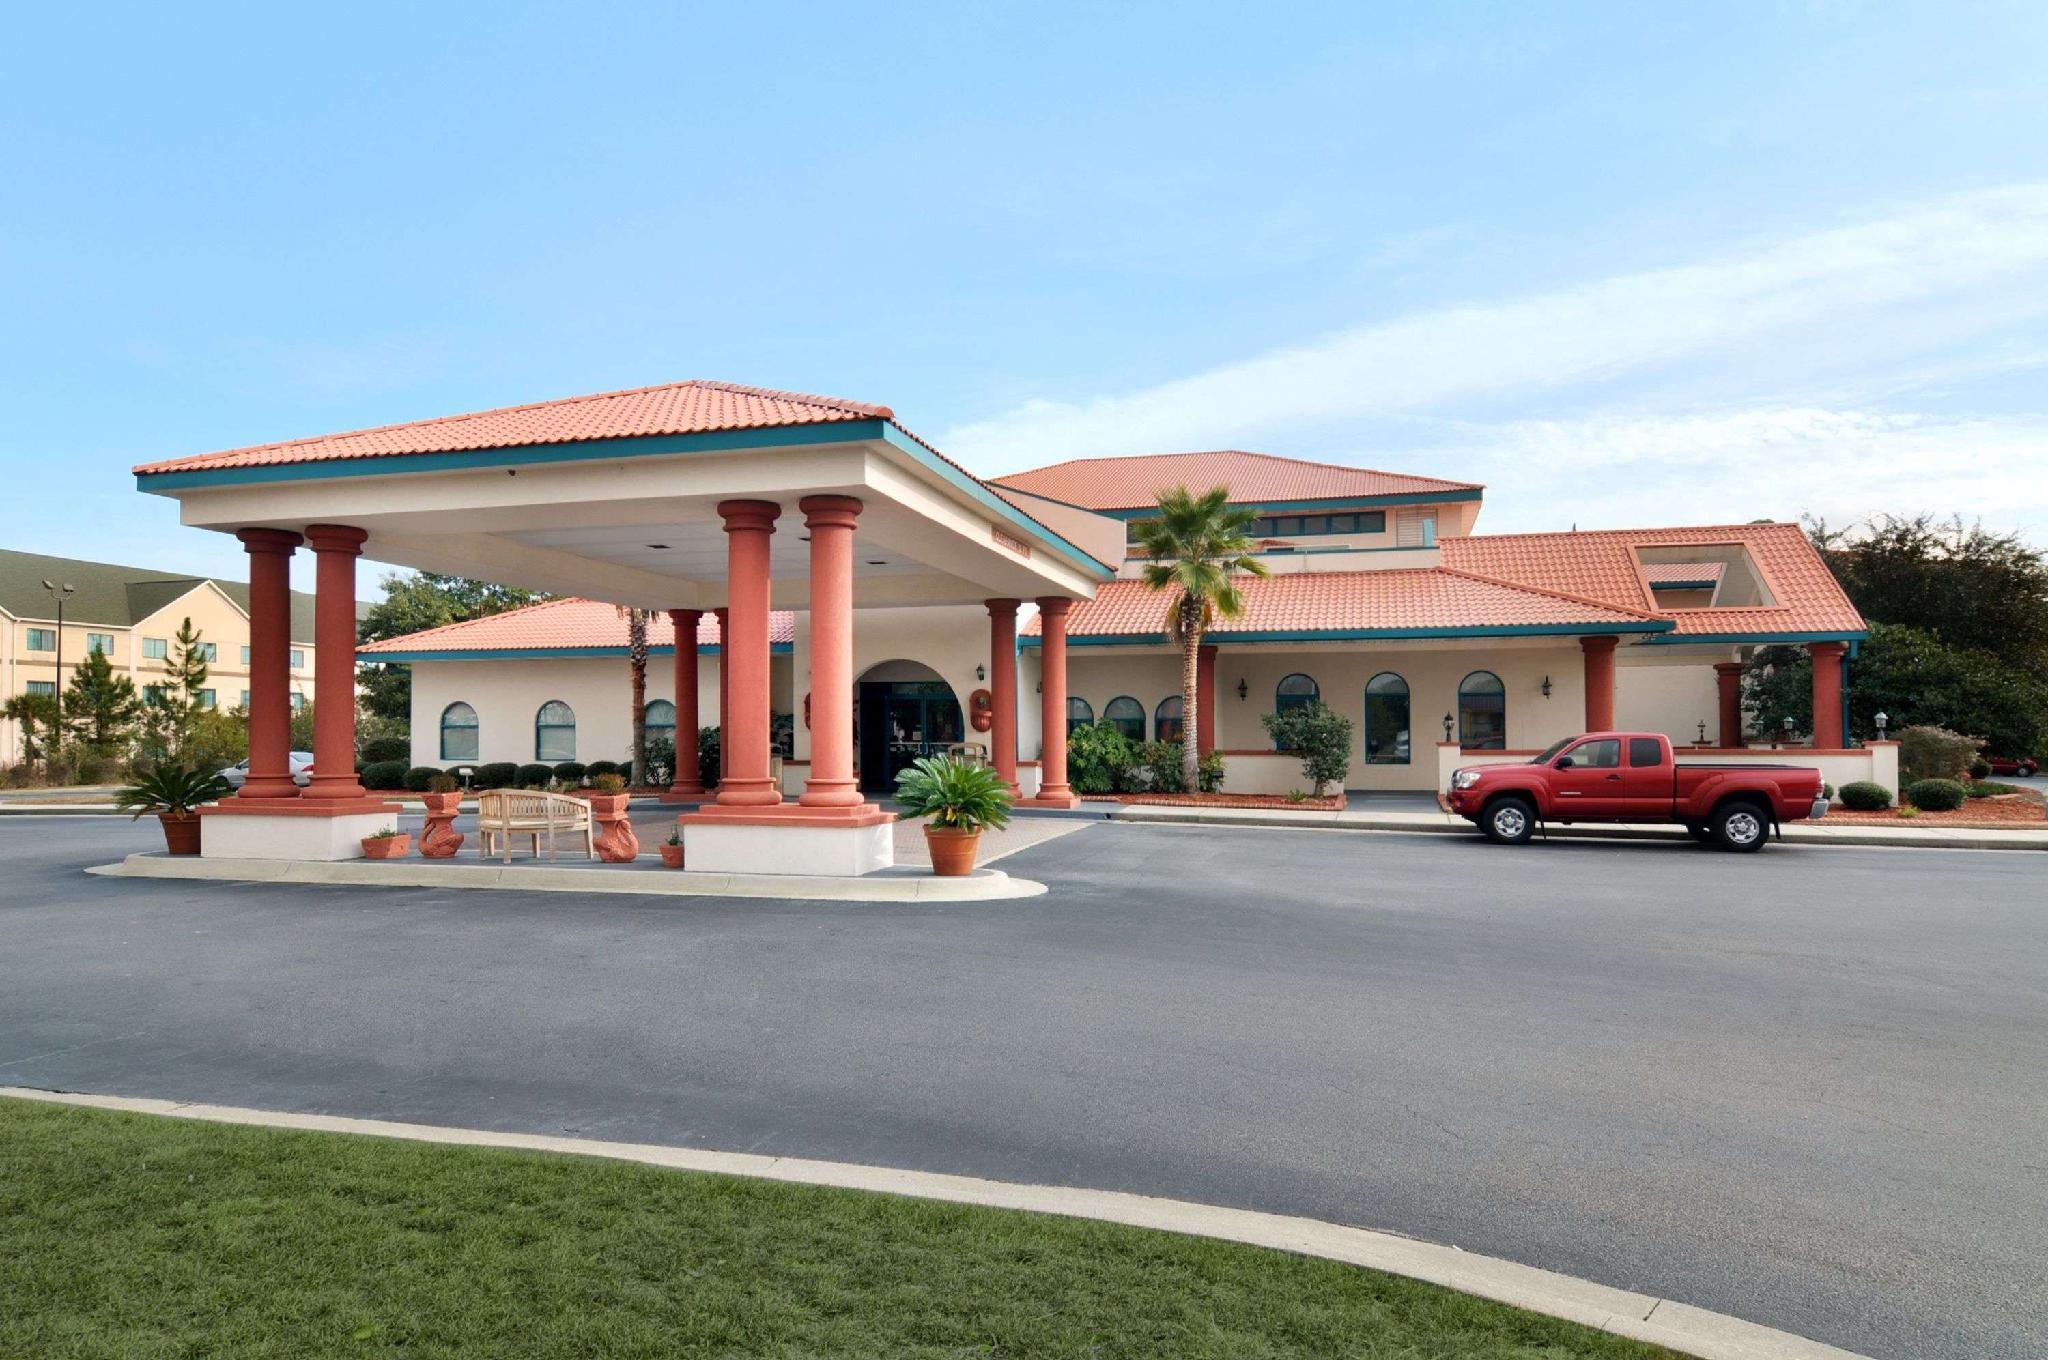 Days Inn And Suites By Wyndham Savannah Gateway I 95 And 204